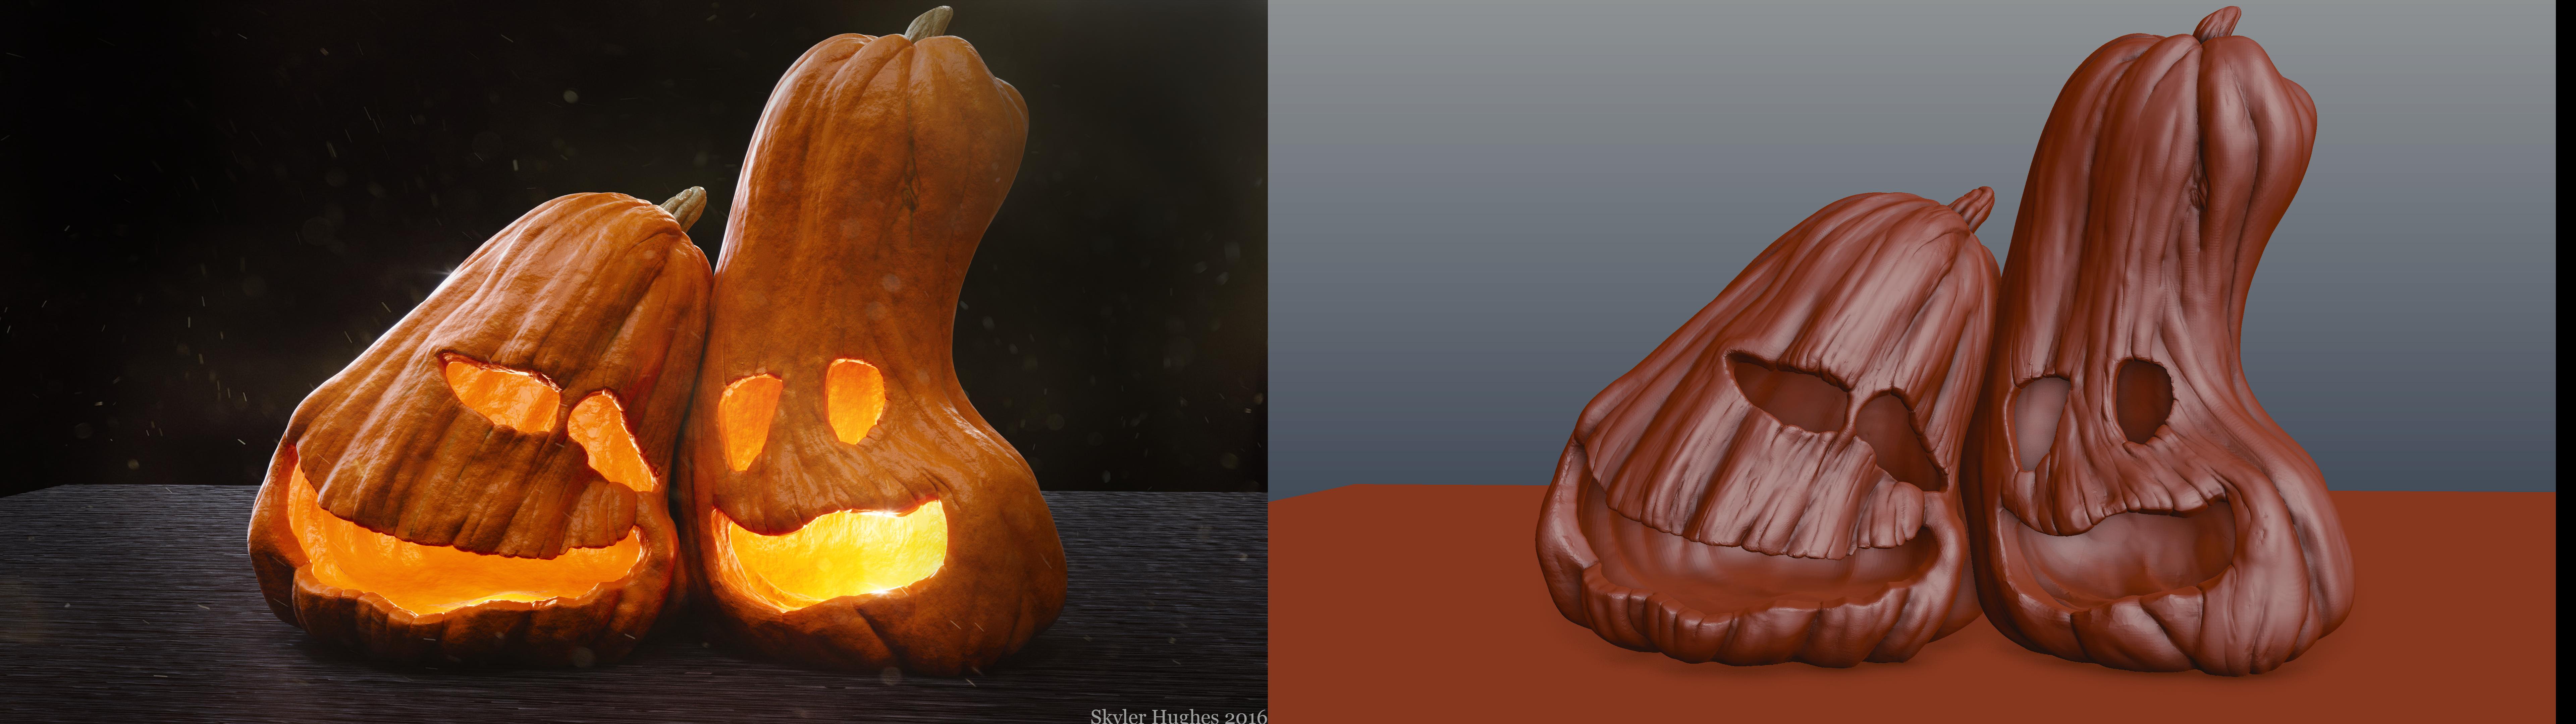 Unfinished Halloween Work- Buddy Pumpkins by Shastro